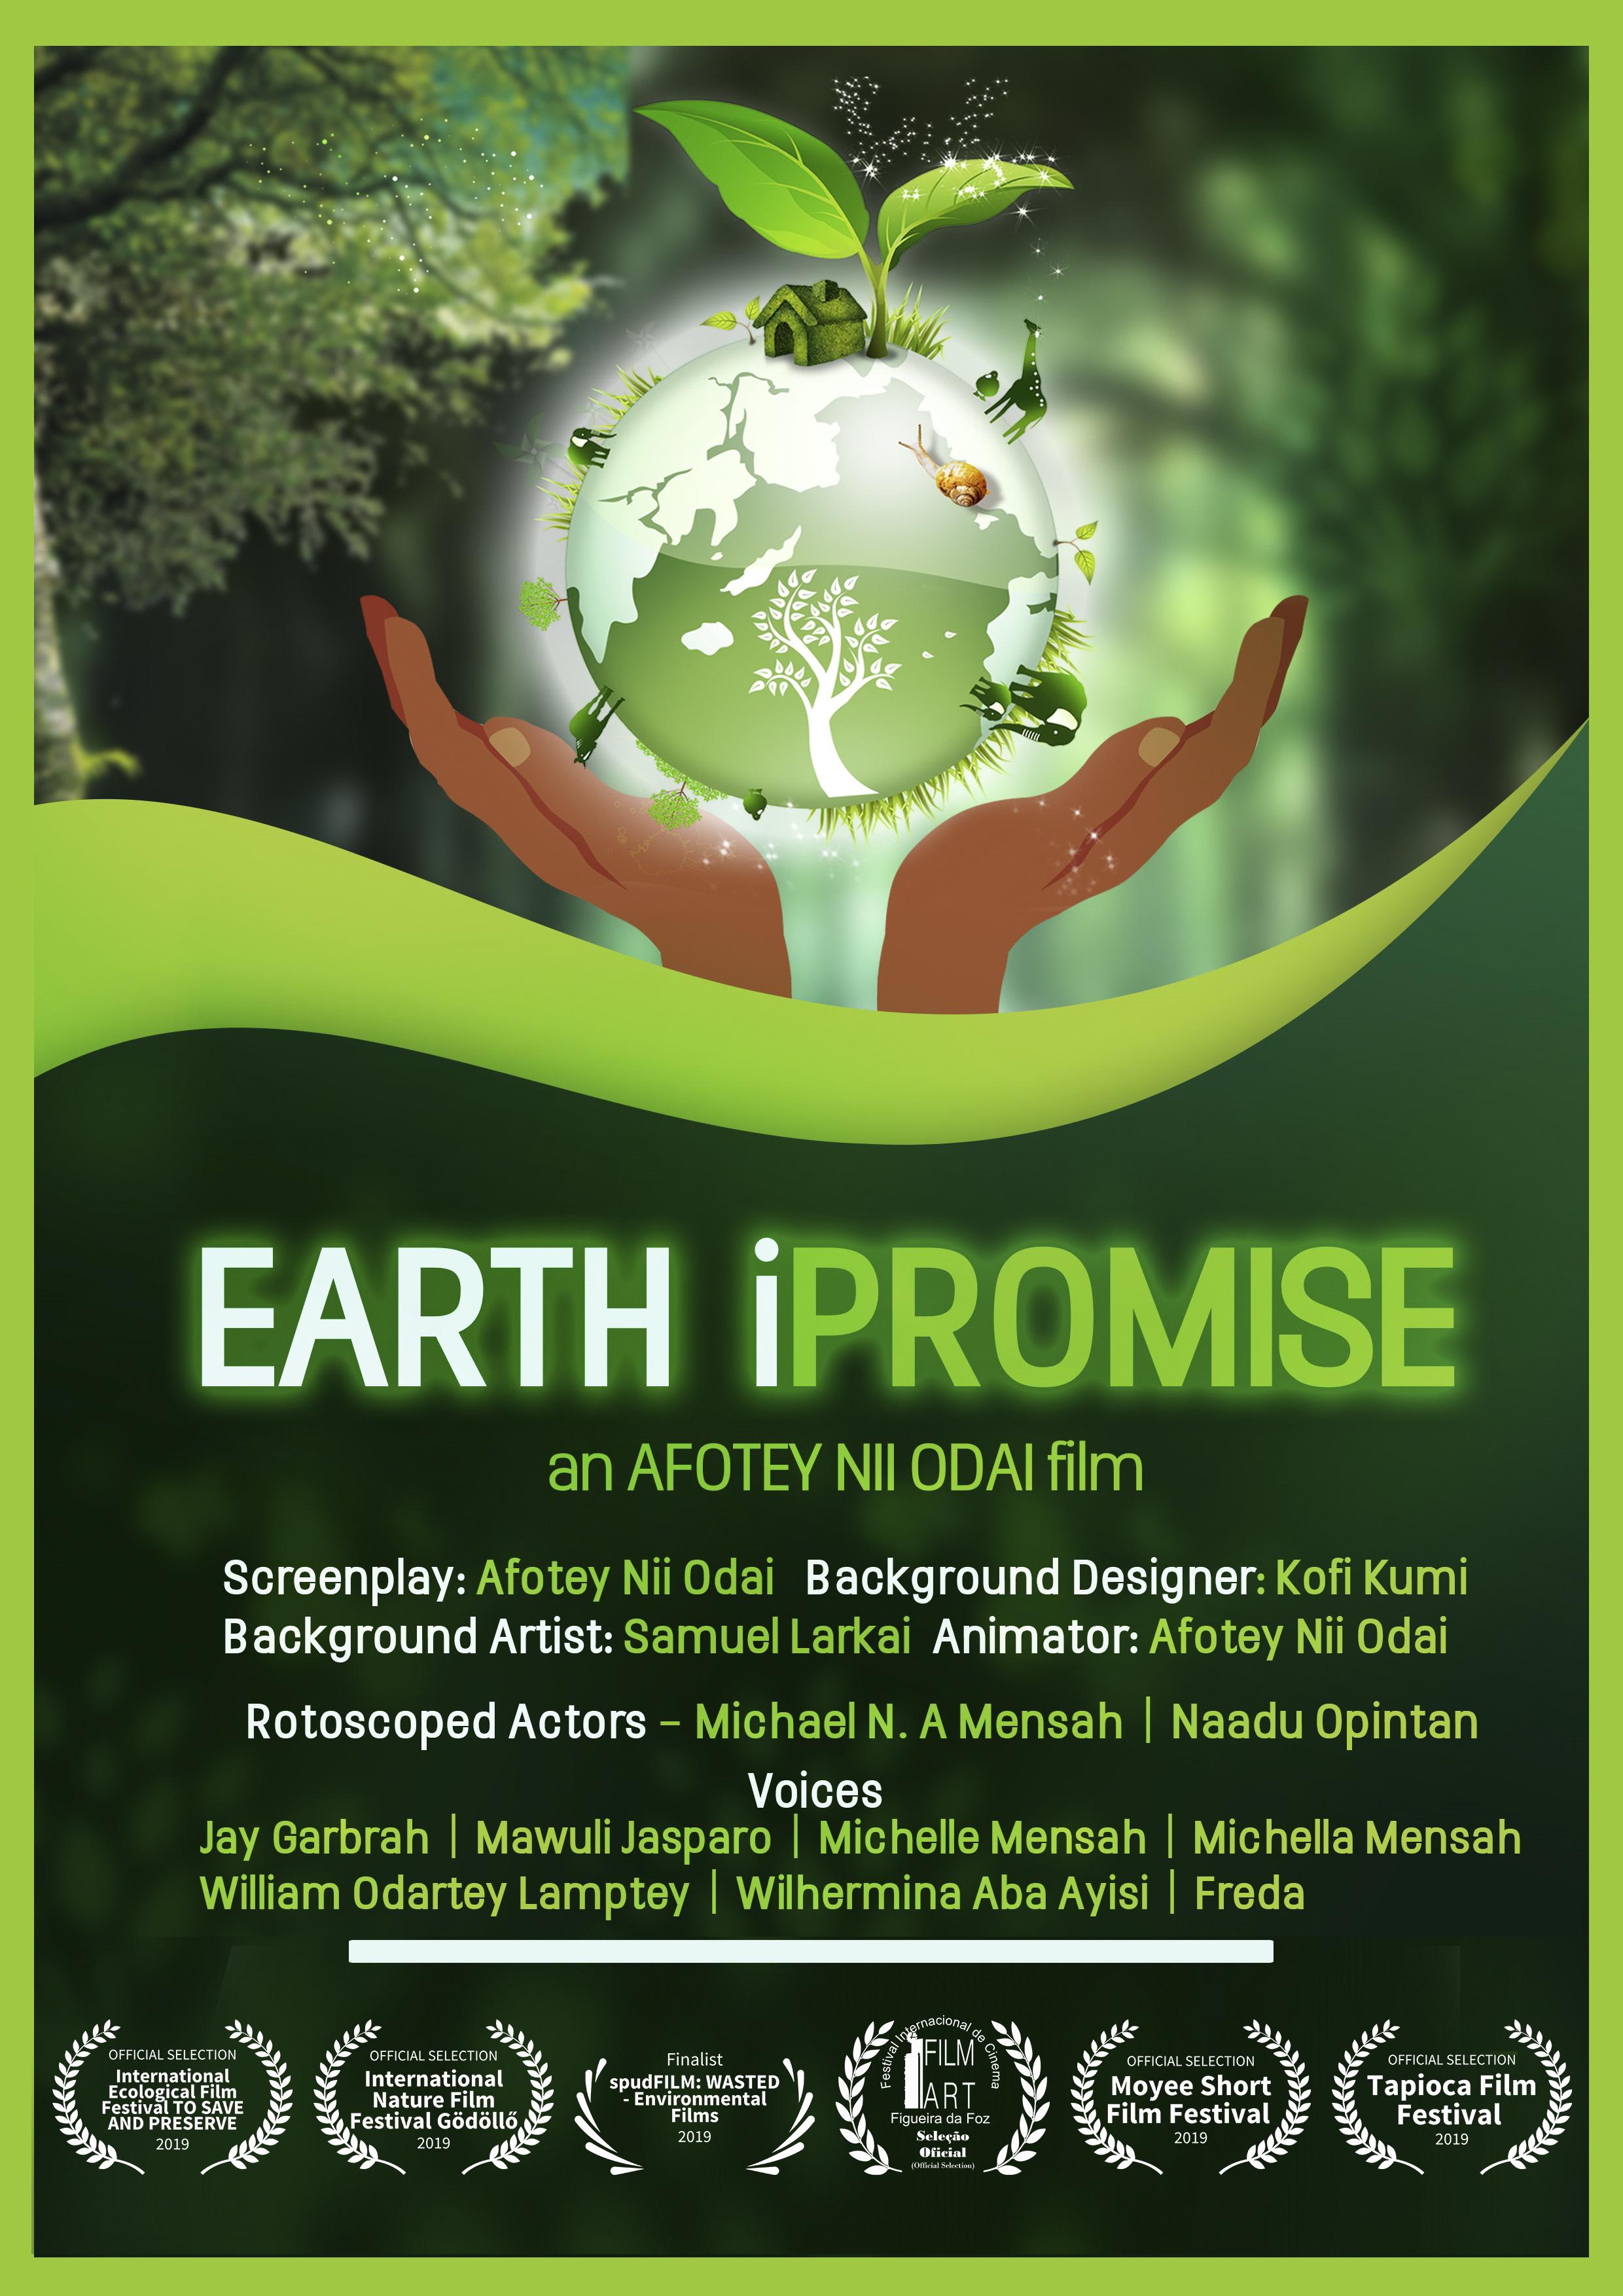 Earth ipromise poster.jpg